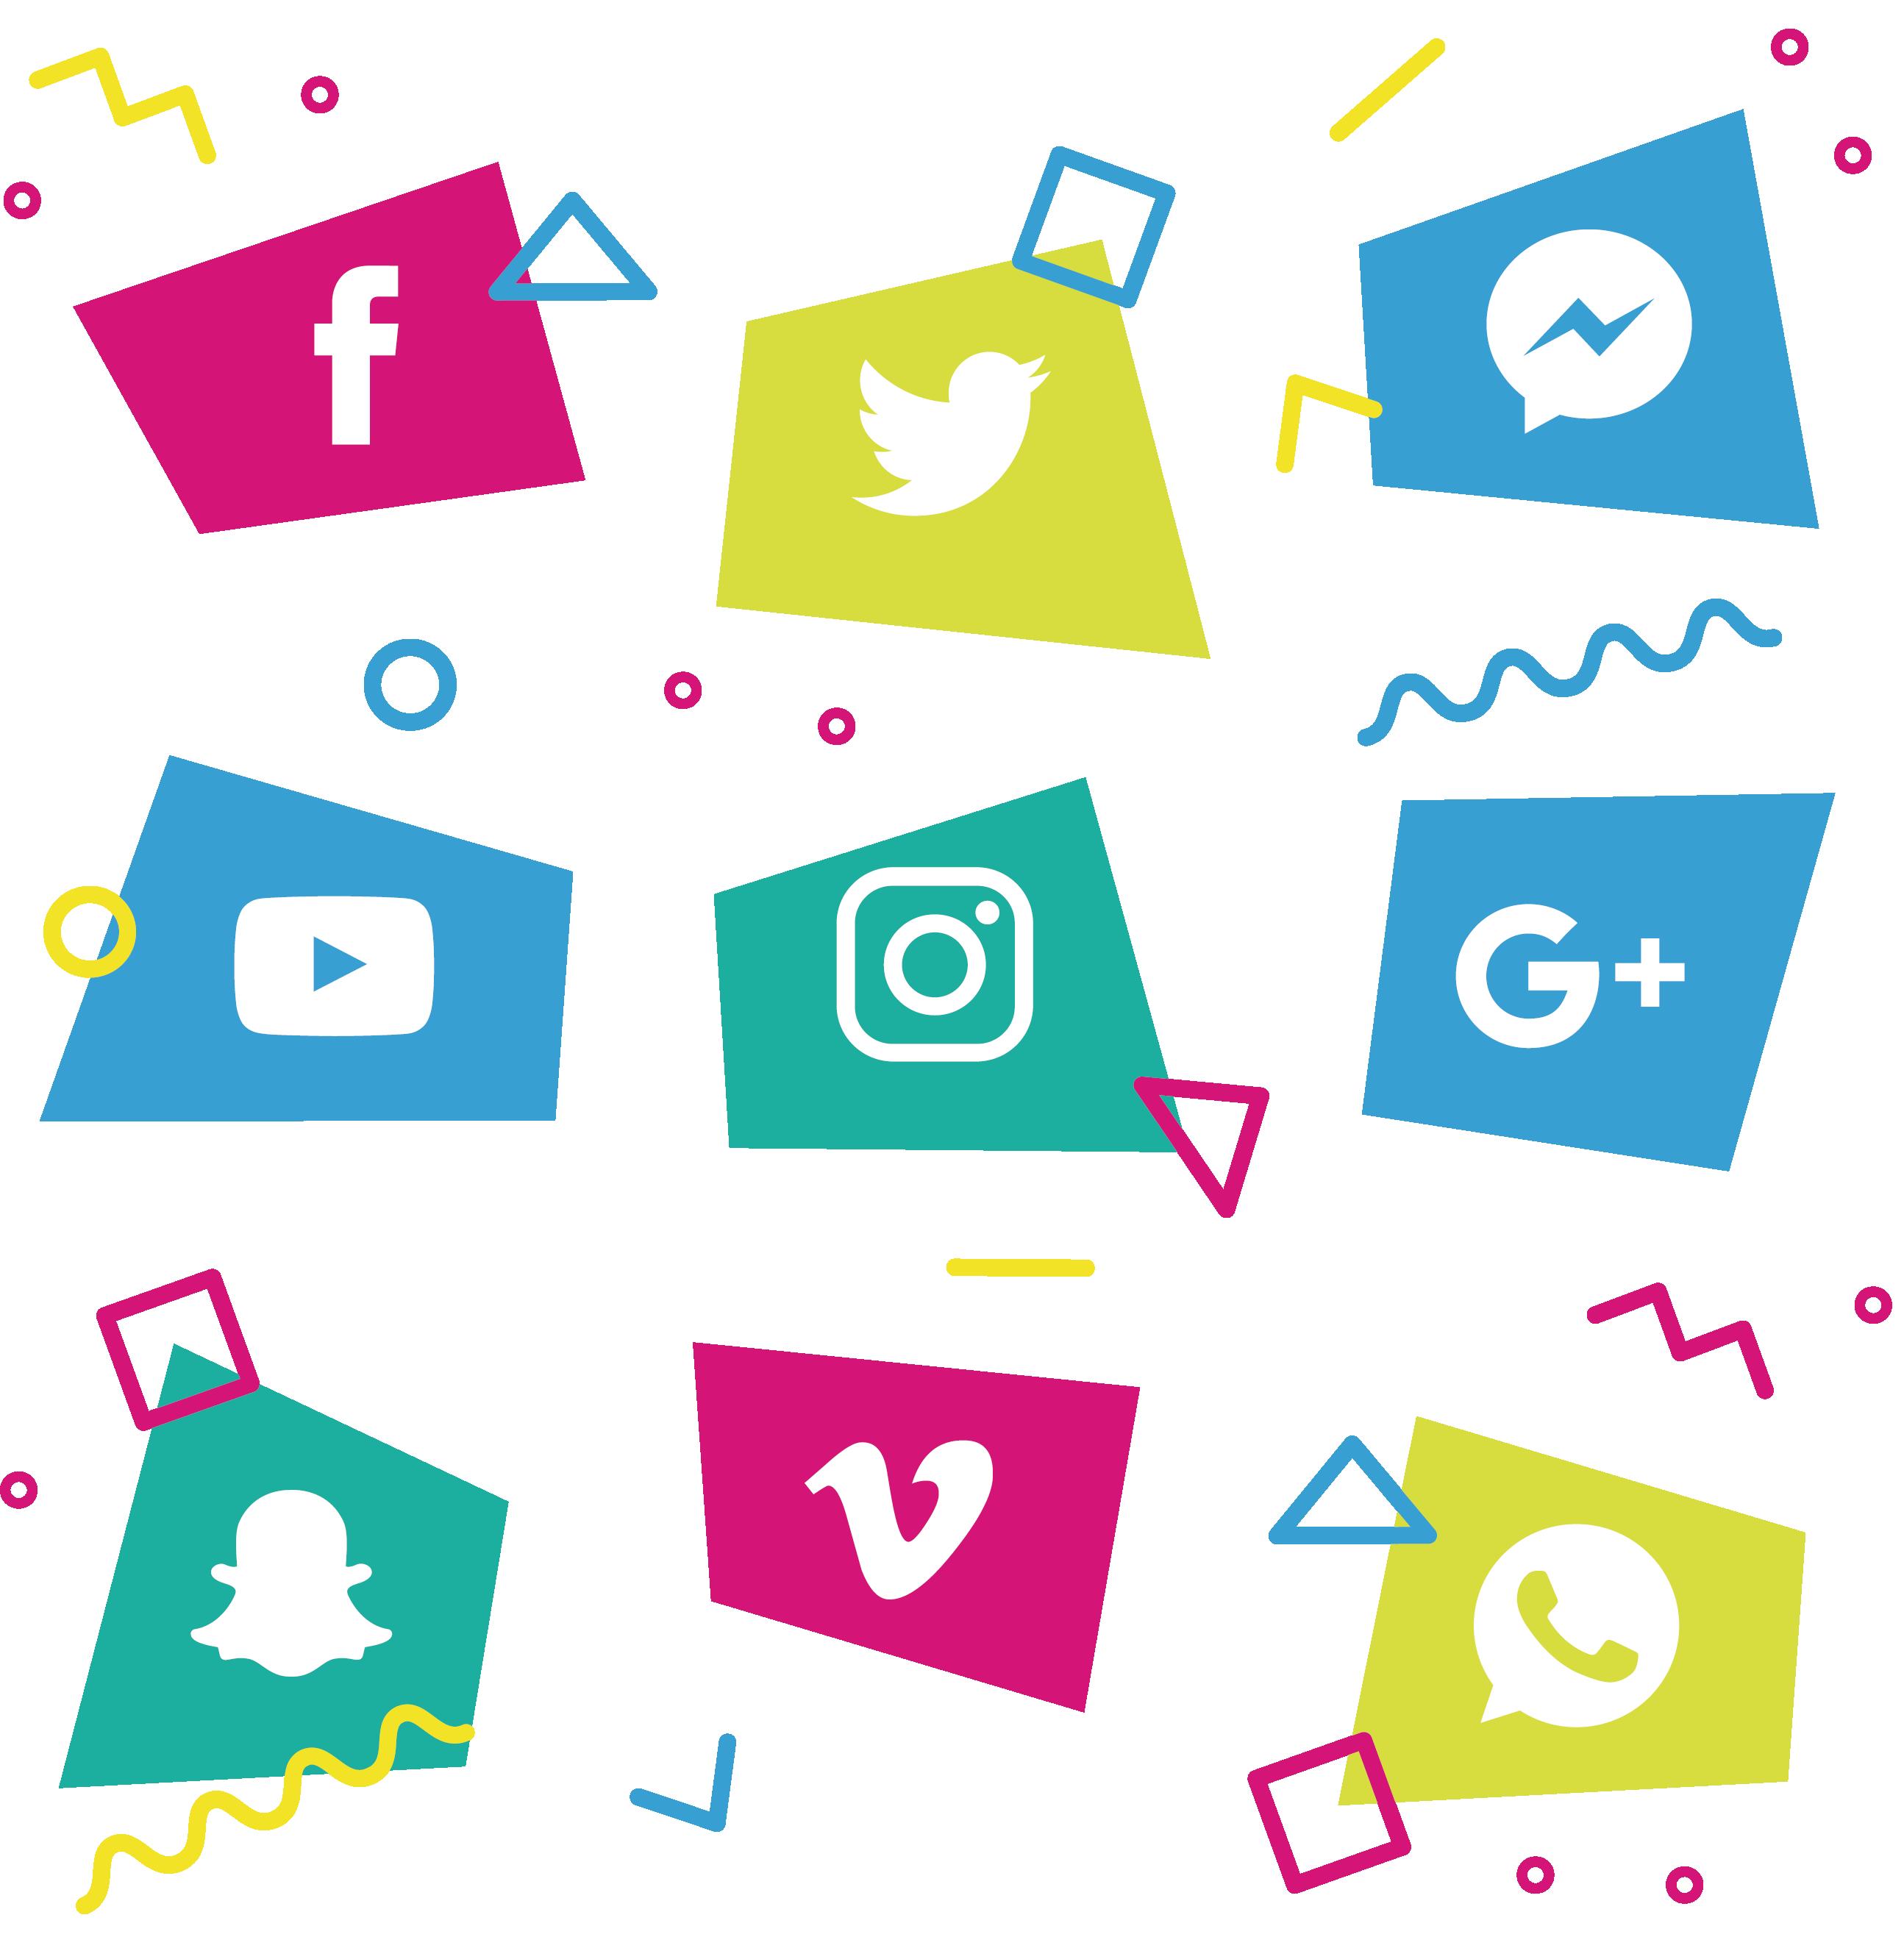 Geometry clipart color shape. Social media icon block